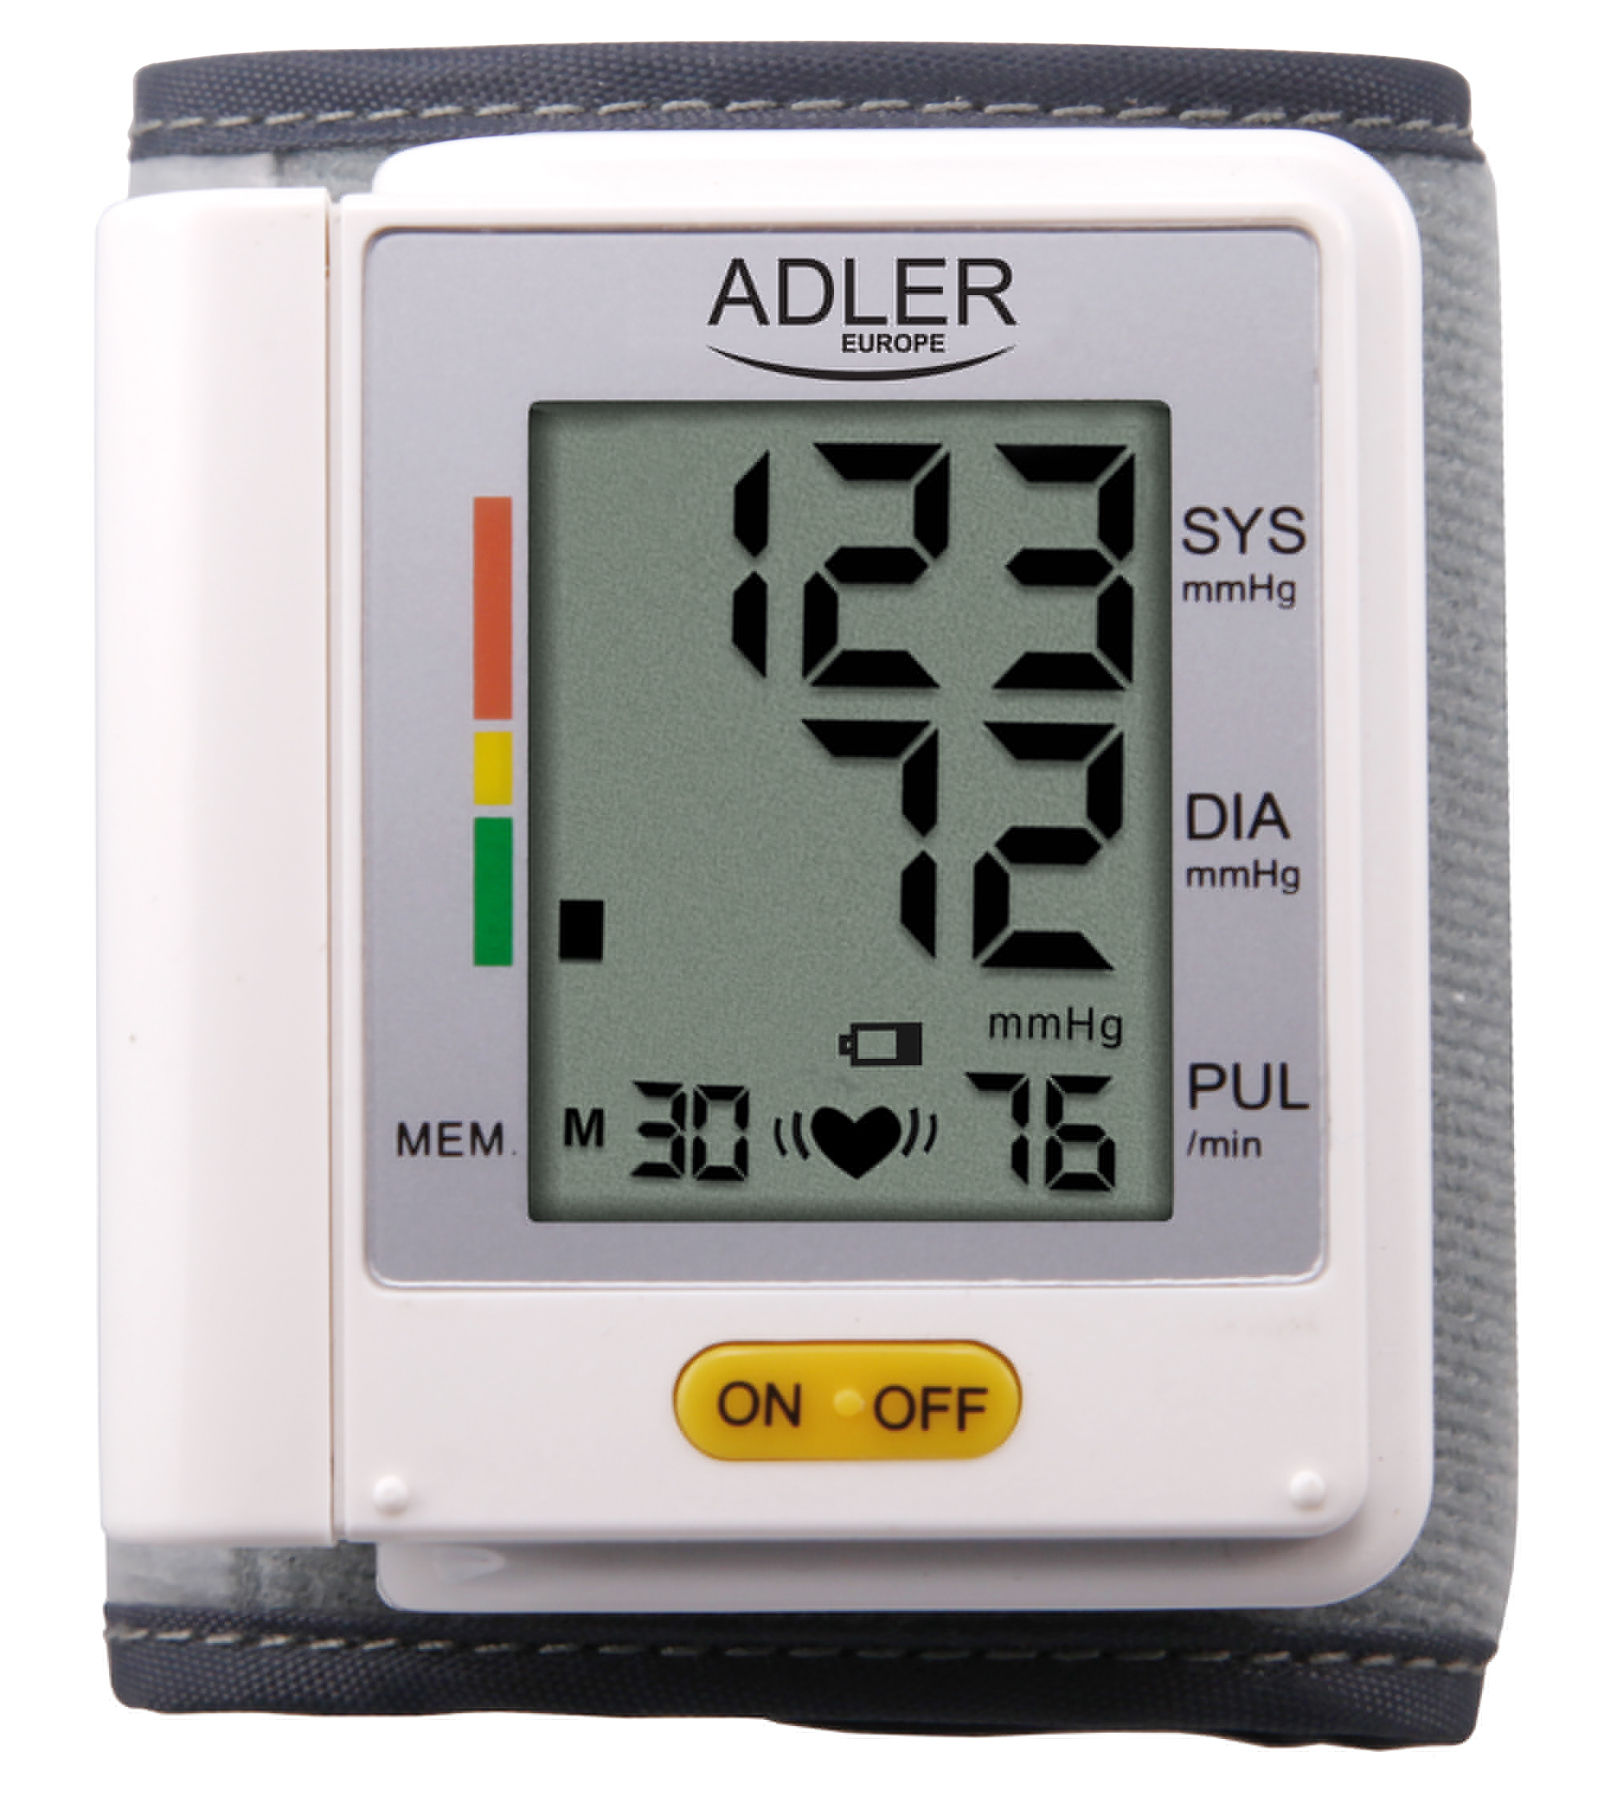 Adler AD 8411 Wrist blood pressure monitor AD 8411 Bezprocentu kredīts